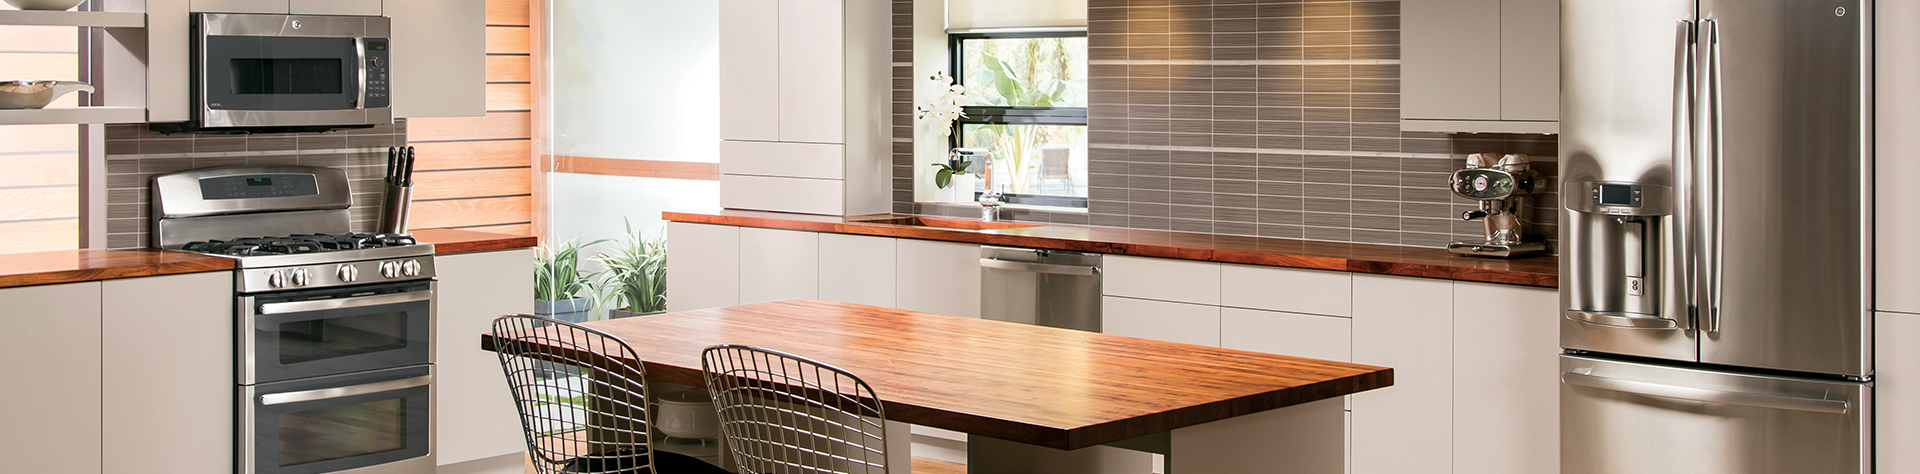 Uncategorized Kitchen Appliances Specialists bade appliance home appliances kitchen in bradley il about us in